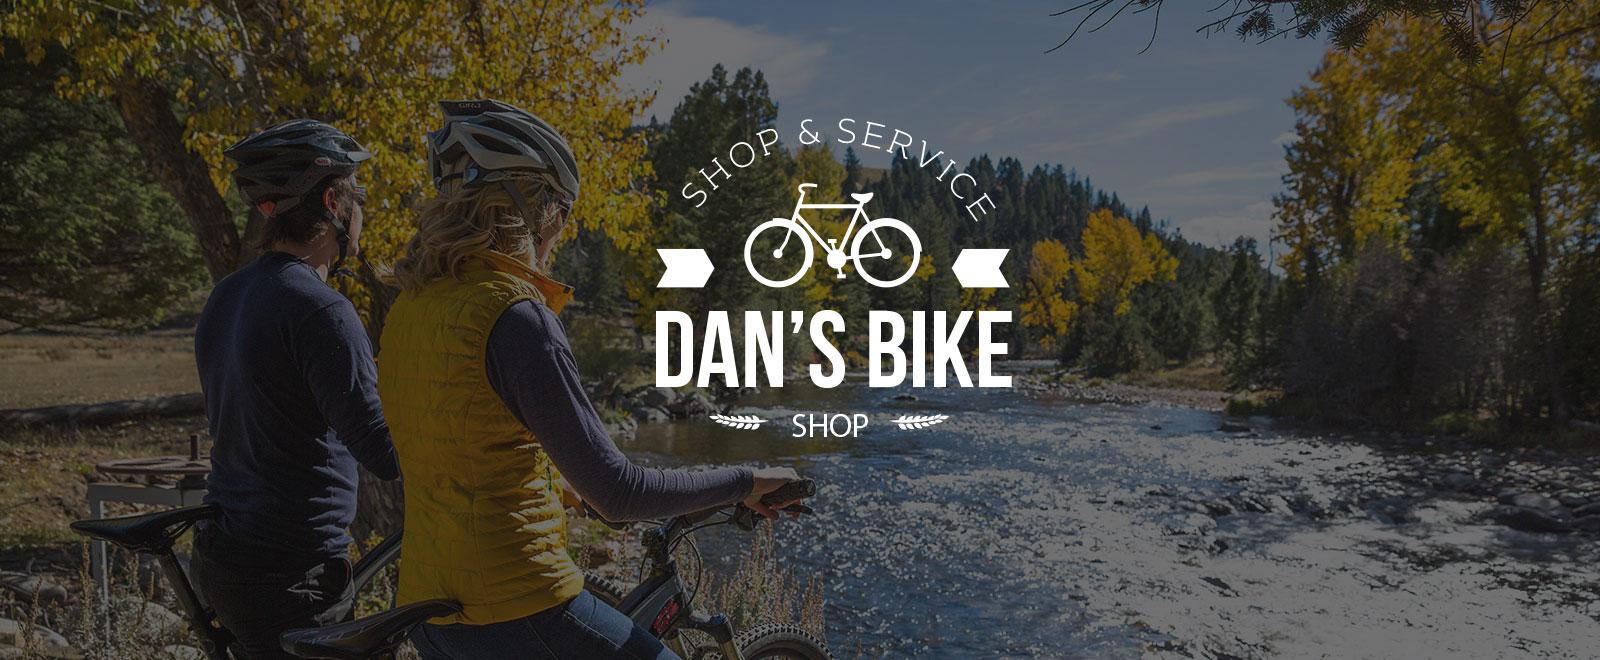 Dan's Bike Shop Ionia - MI